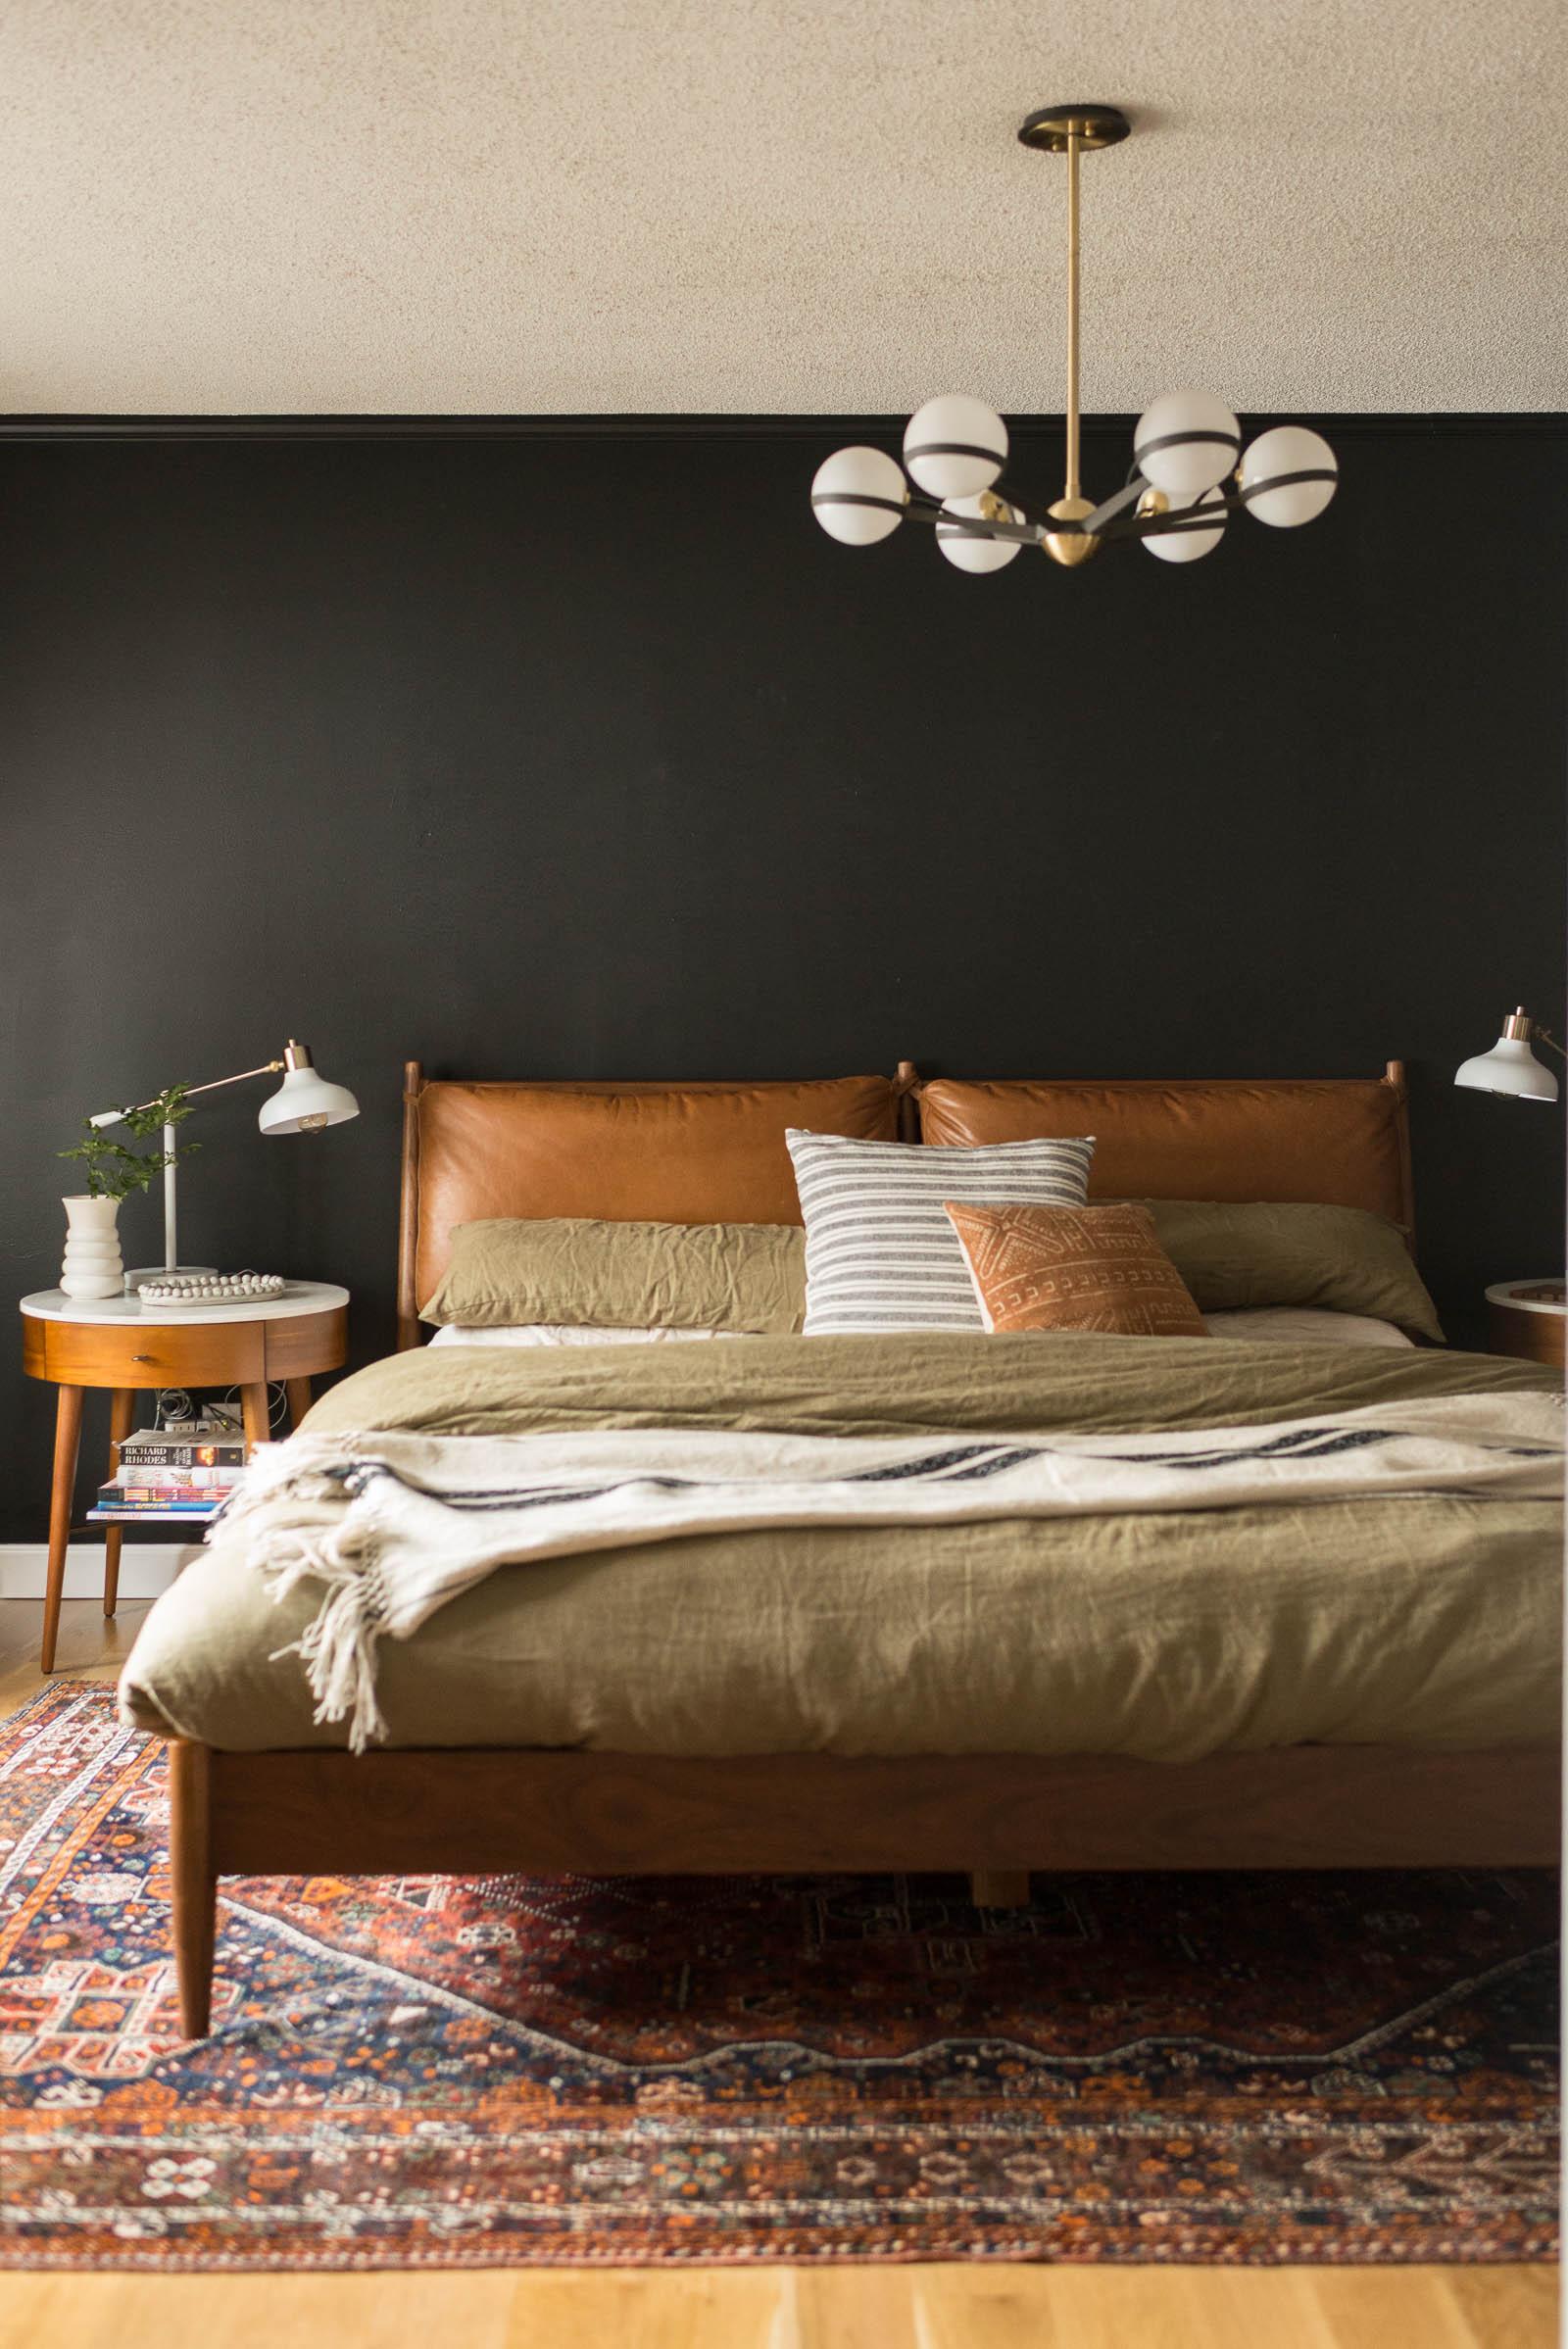 Dark & Moody Master Bedroom Inspiration | Miranda Schroeder Blog  www.mirandaschroeder.com